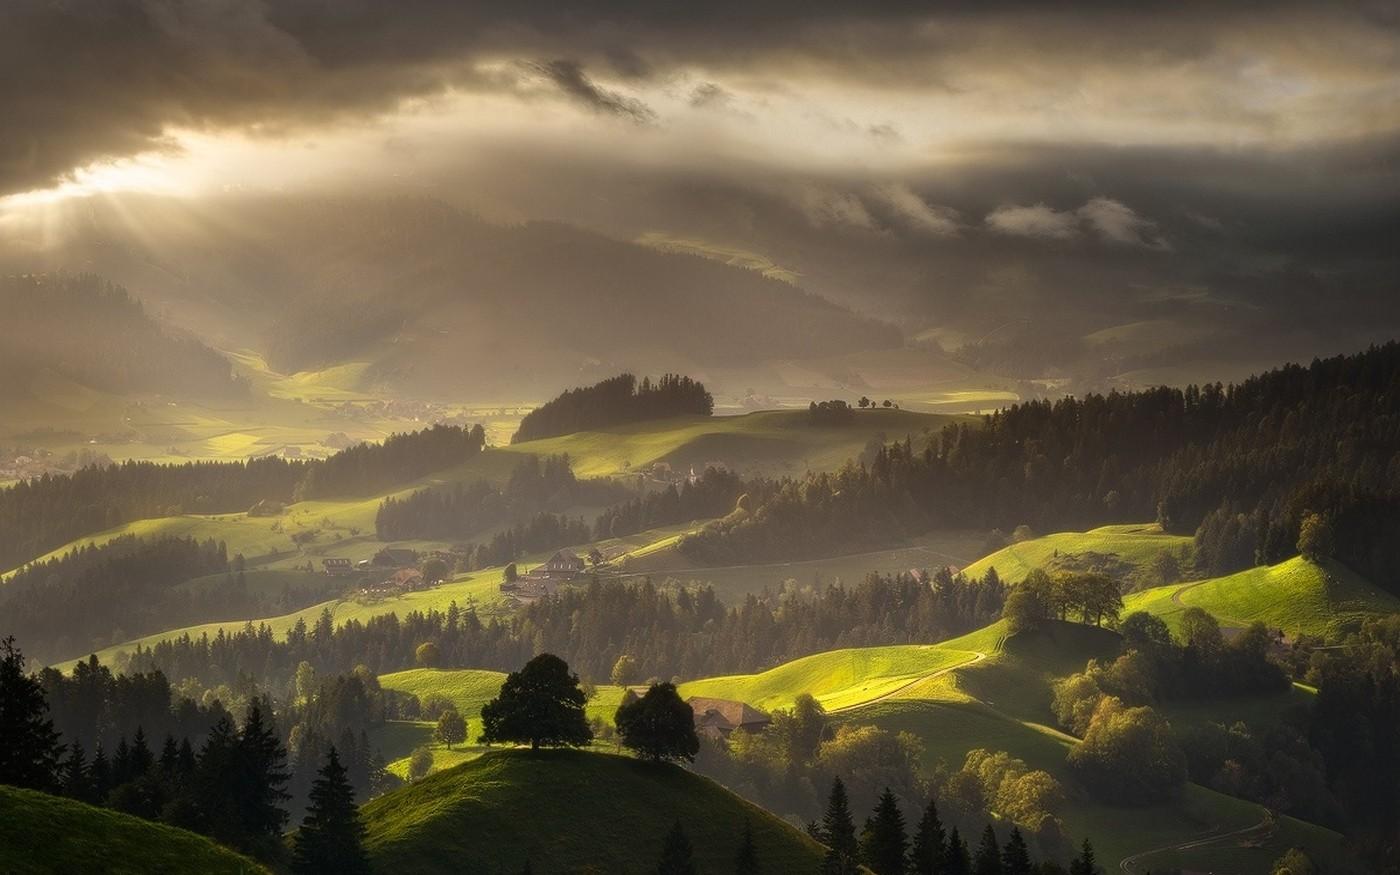 Fb Wallpaper Hd Switzerland Landscape Forest Mist Nature Mountain